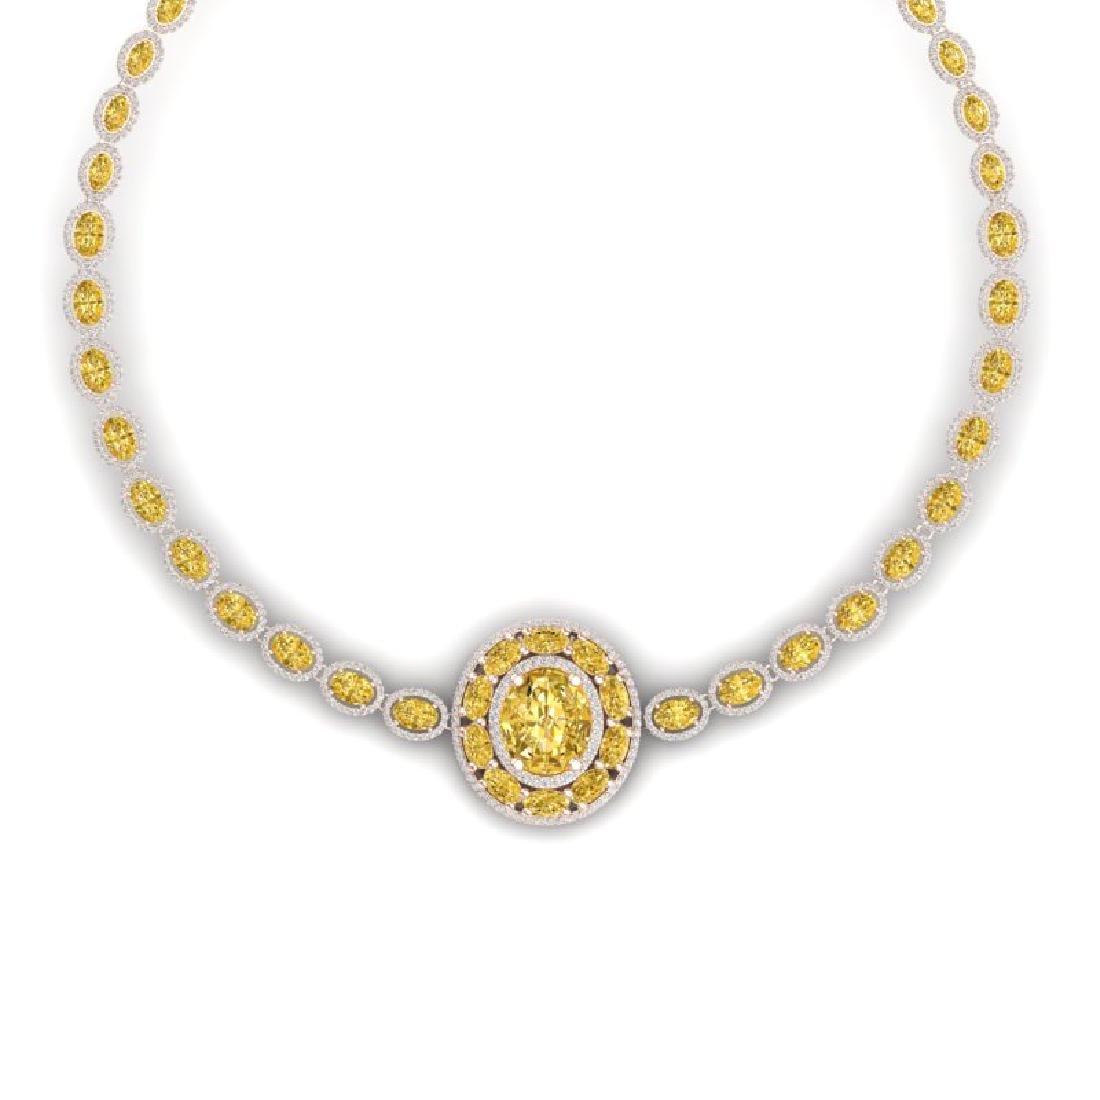 39.04 CTW Royalty Canary Citrine & VS Diamond Necklace - 2